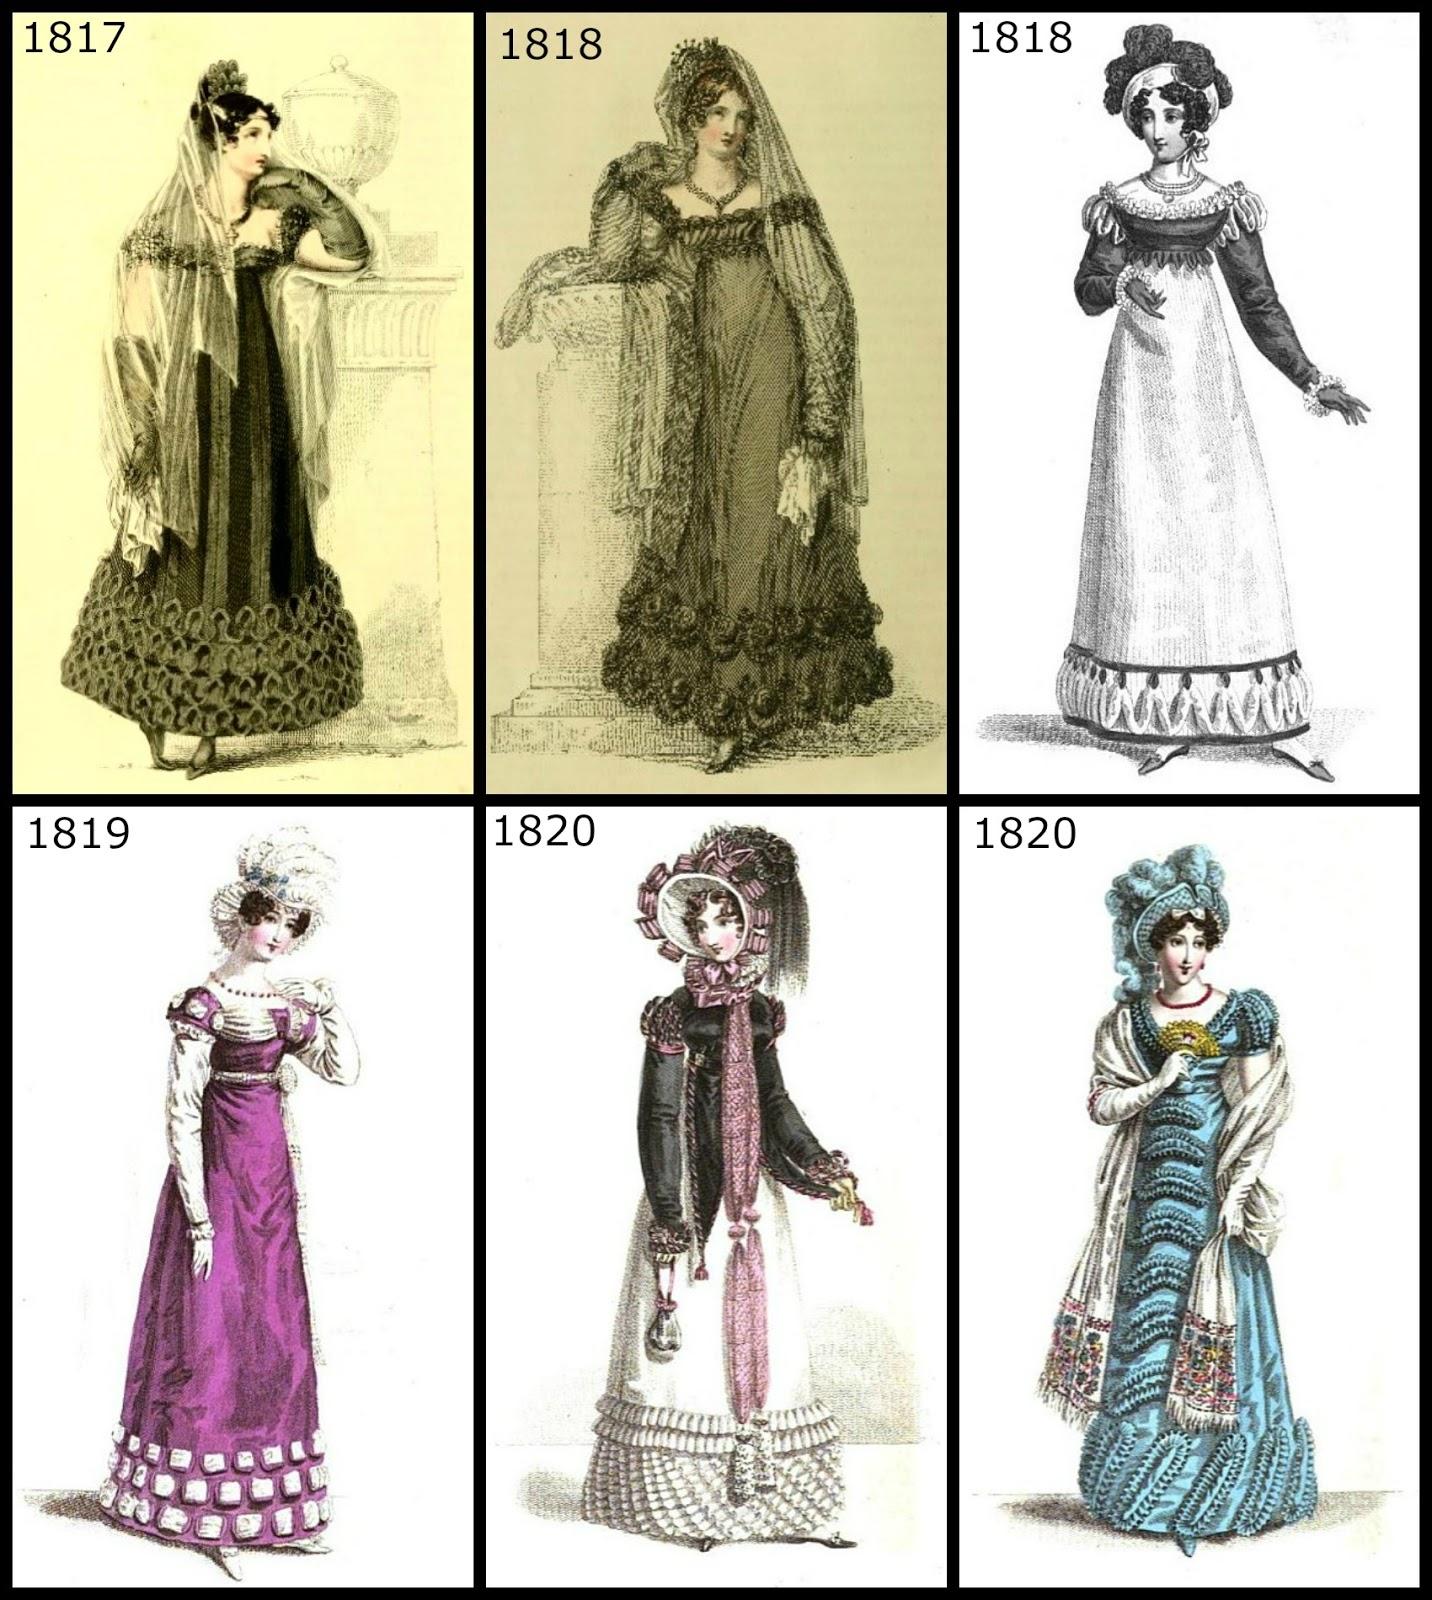 Regency History: Regency Era Fashion For Christmas 1806-1820